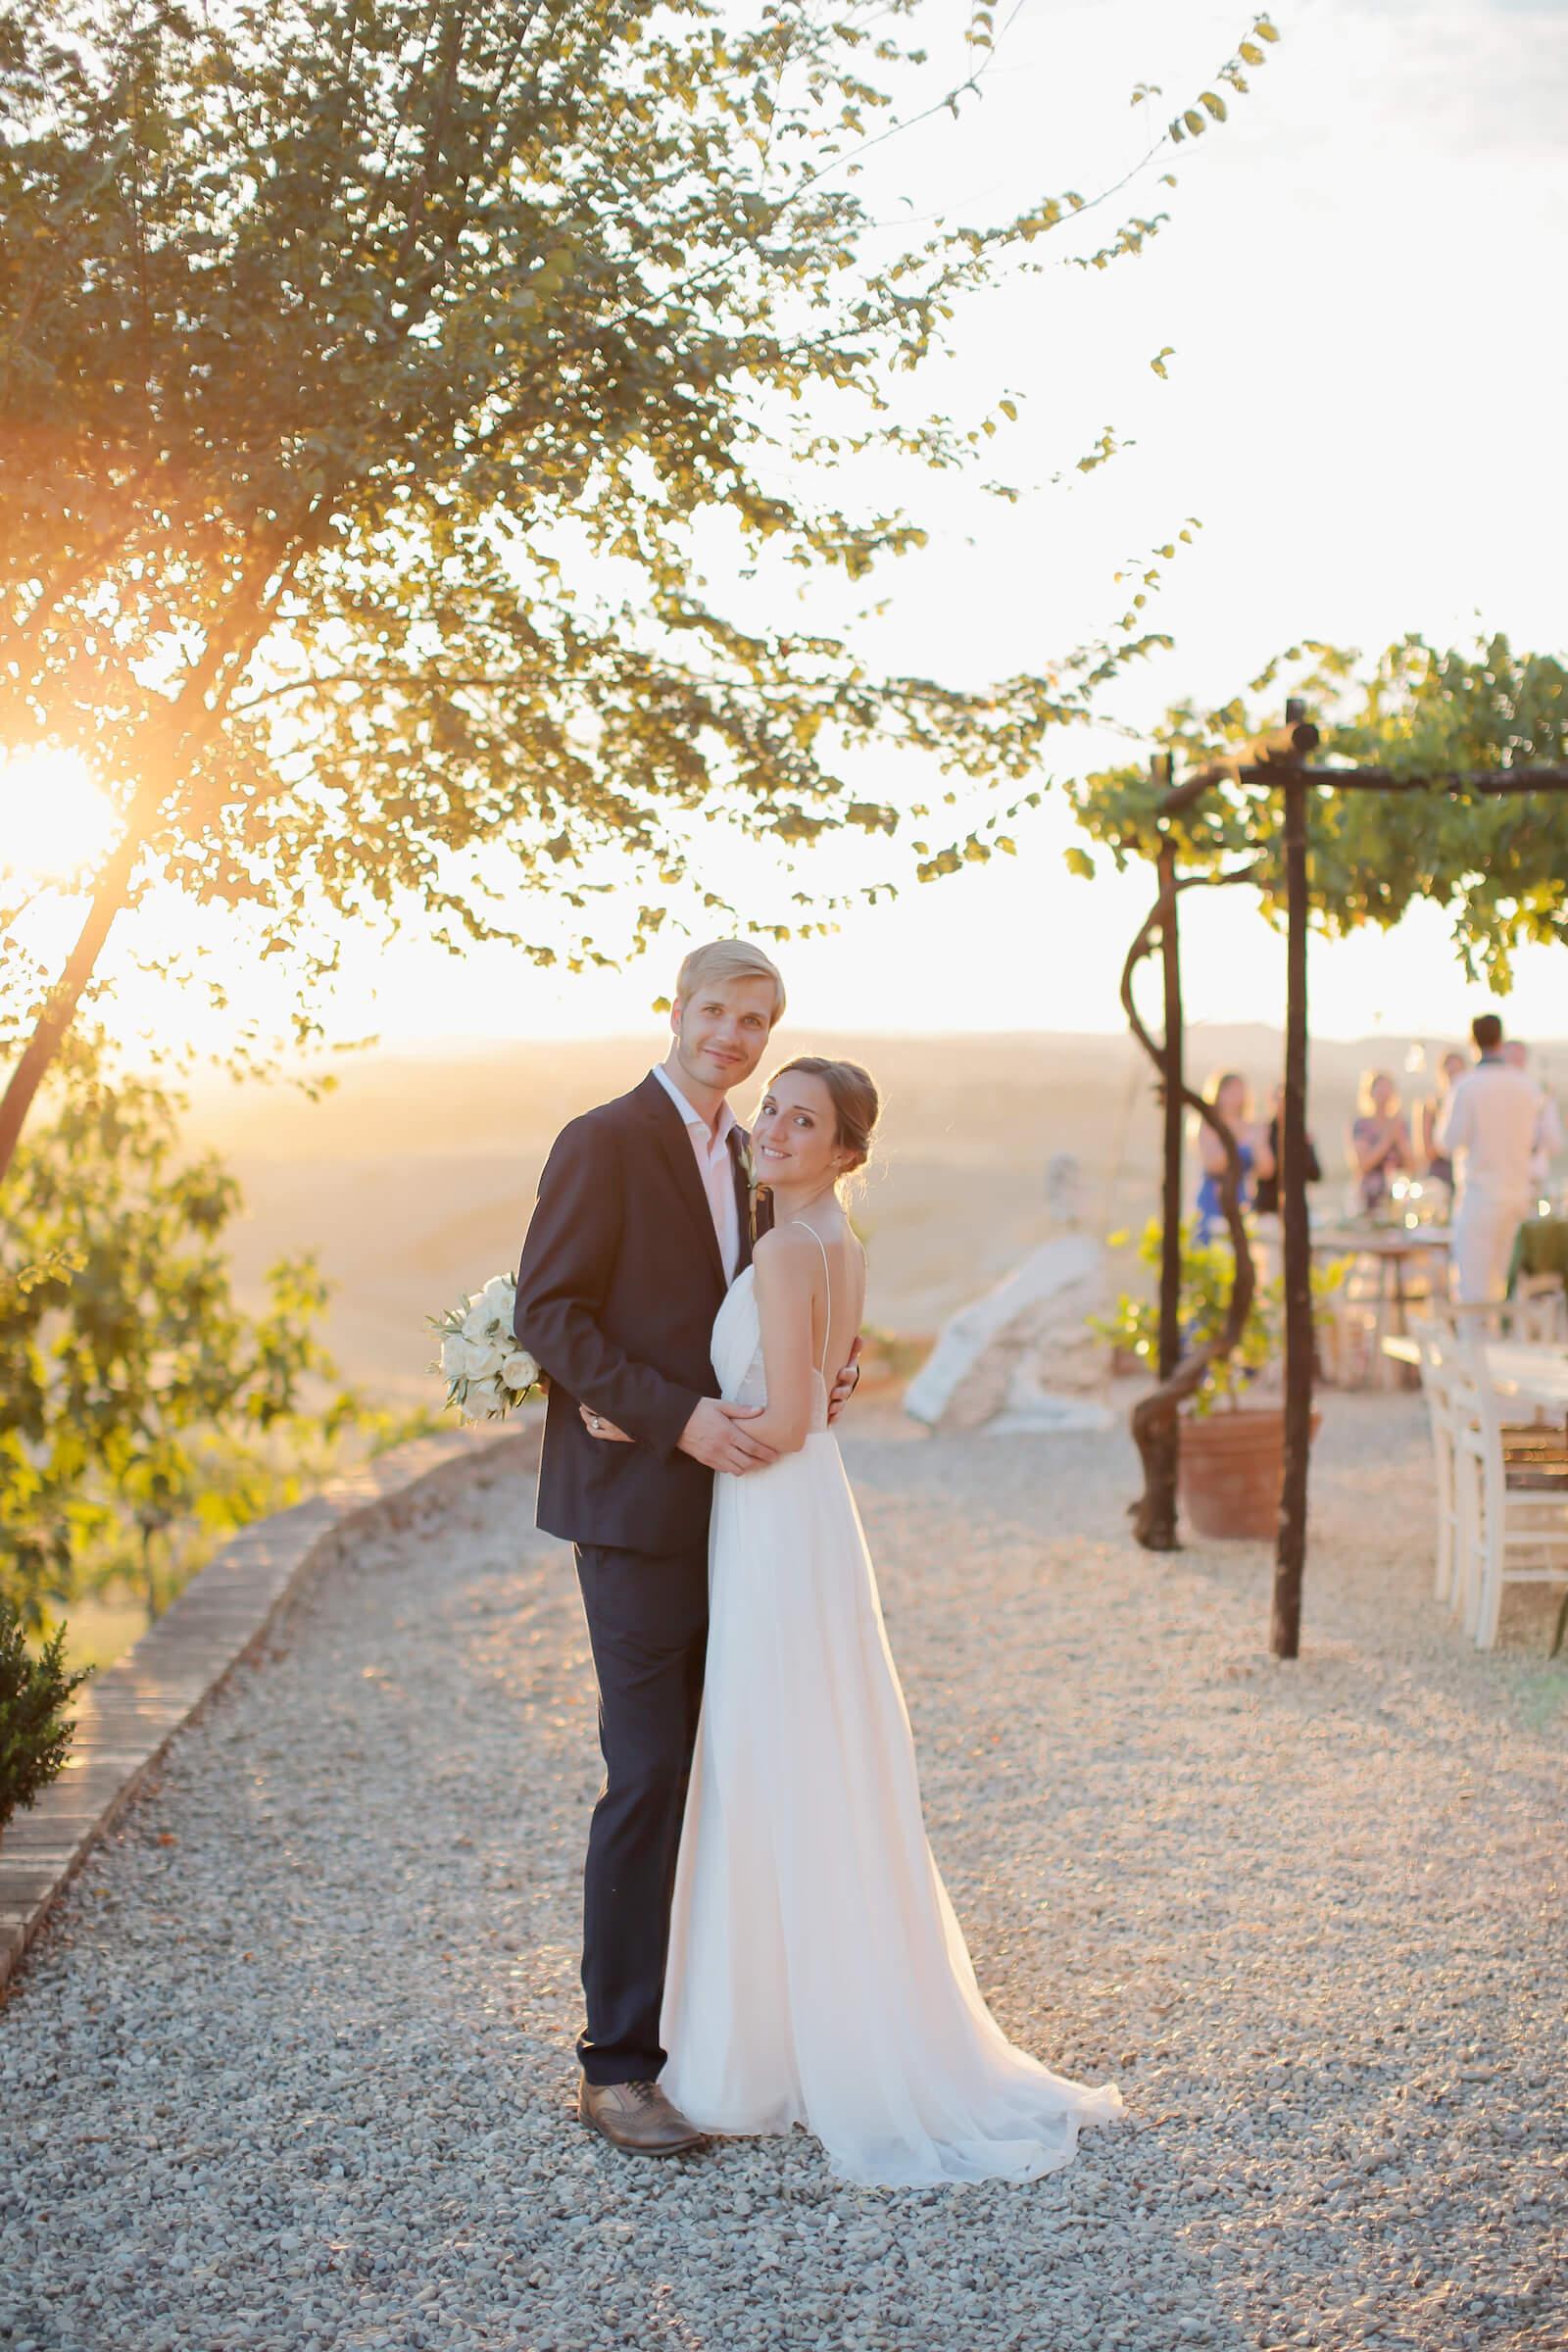 Organiser un mariage en Italie